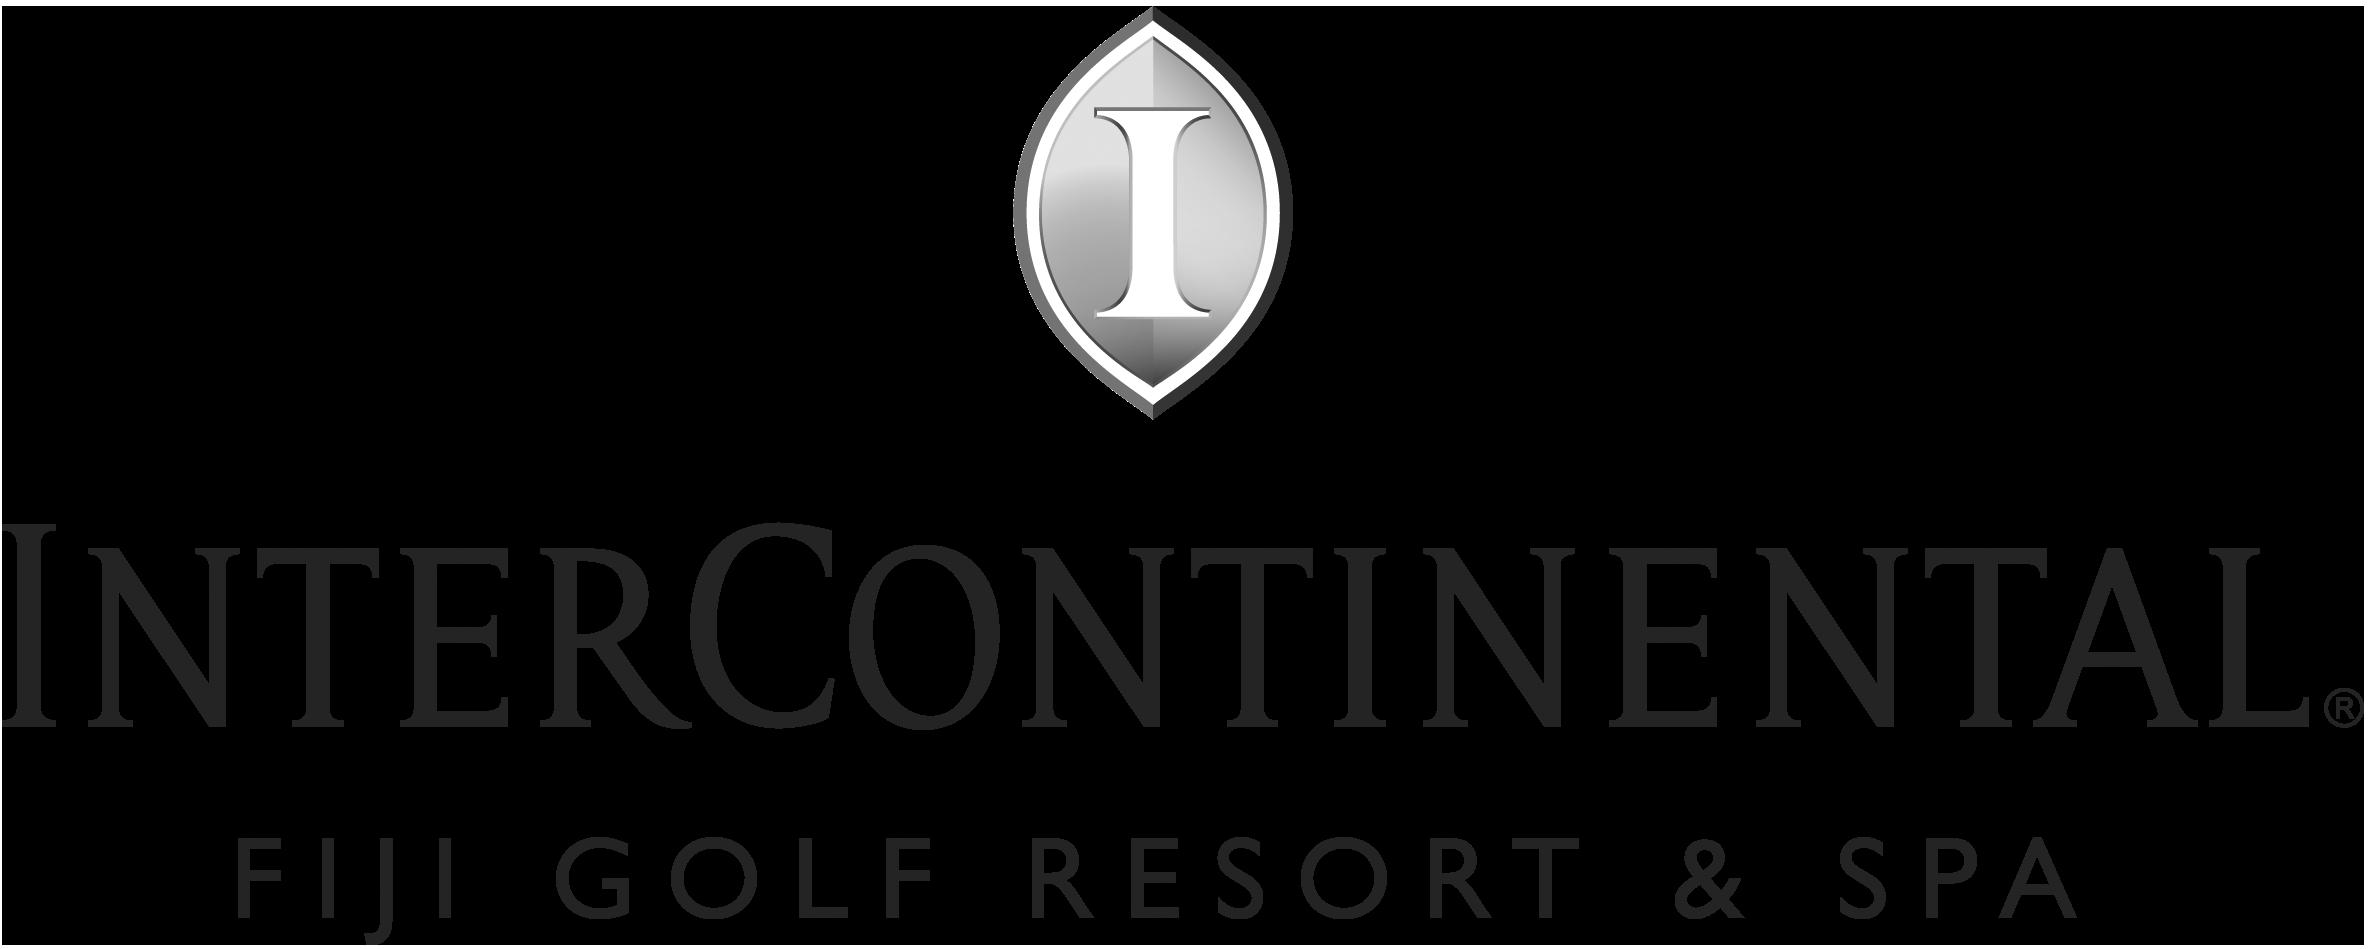 InterContinental Fiji Golf Resort and Spa, Natadola